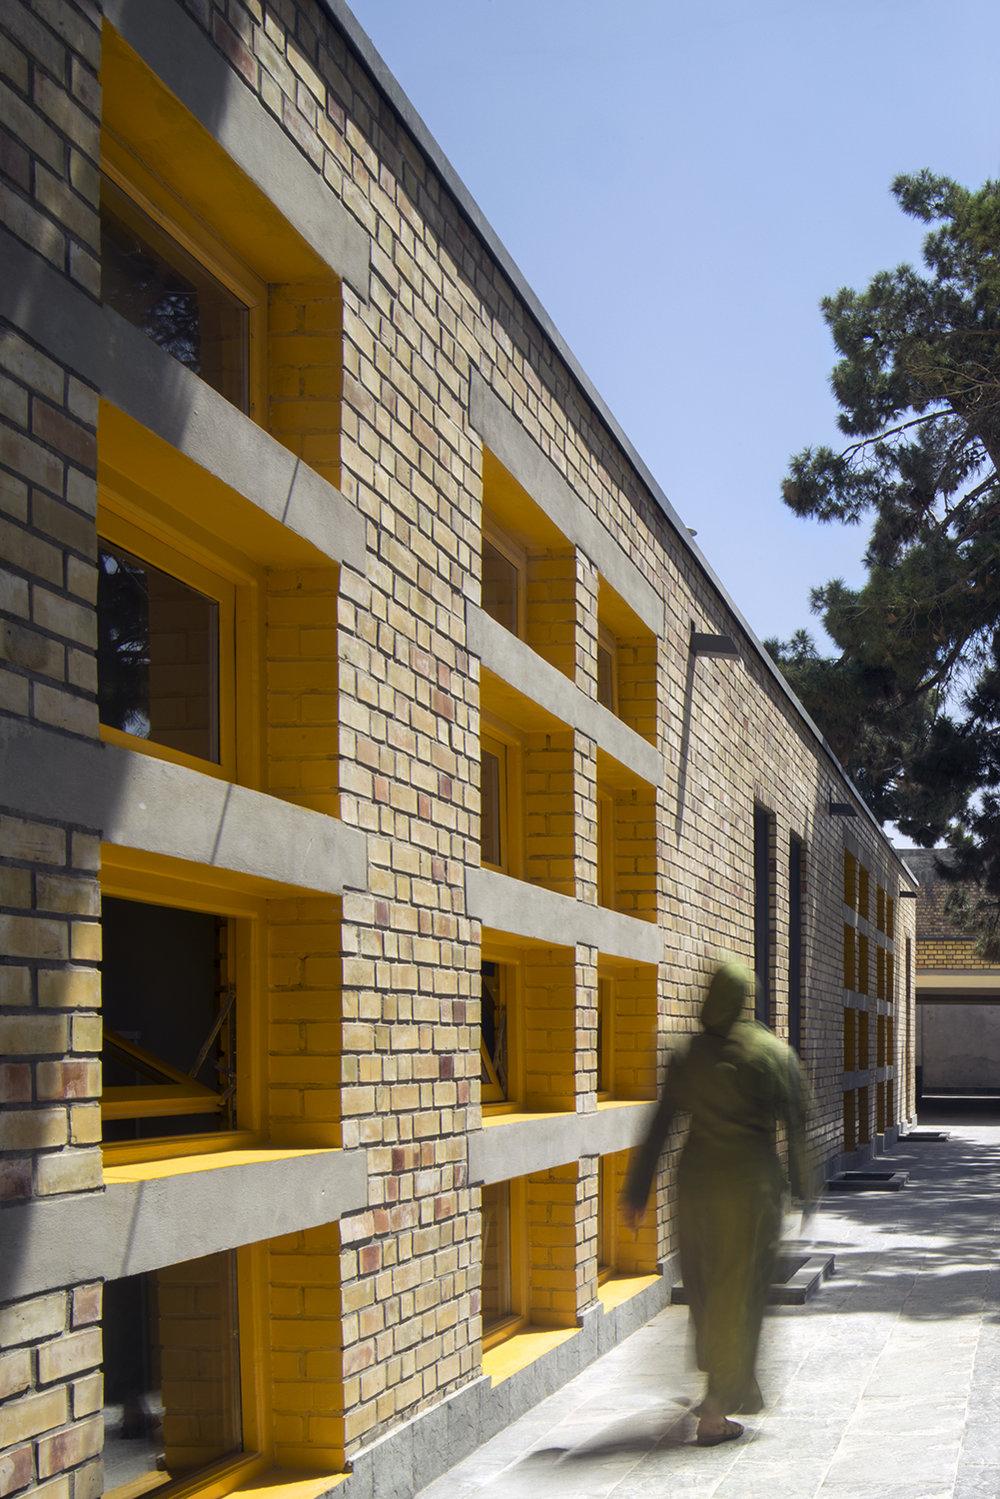 Goharkhatoon Girl School offices@Nic Lehoux.jpg